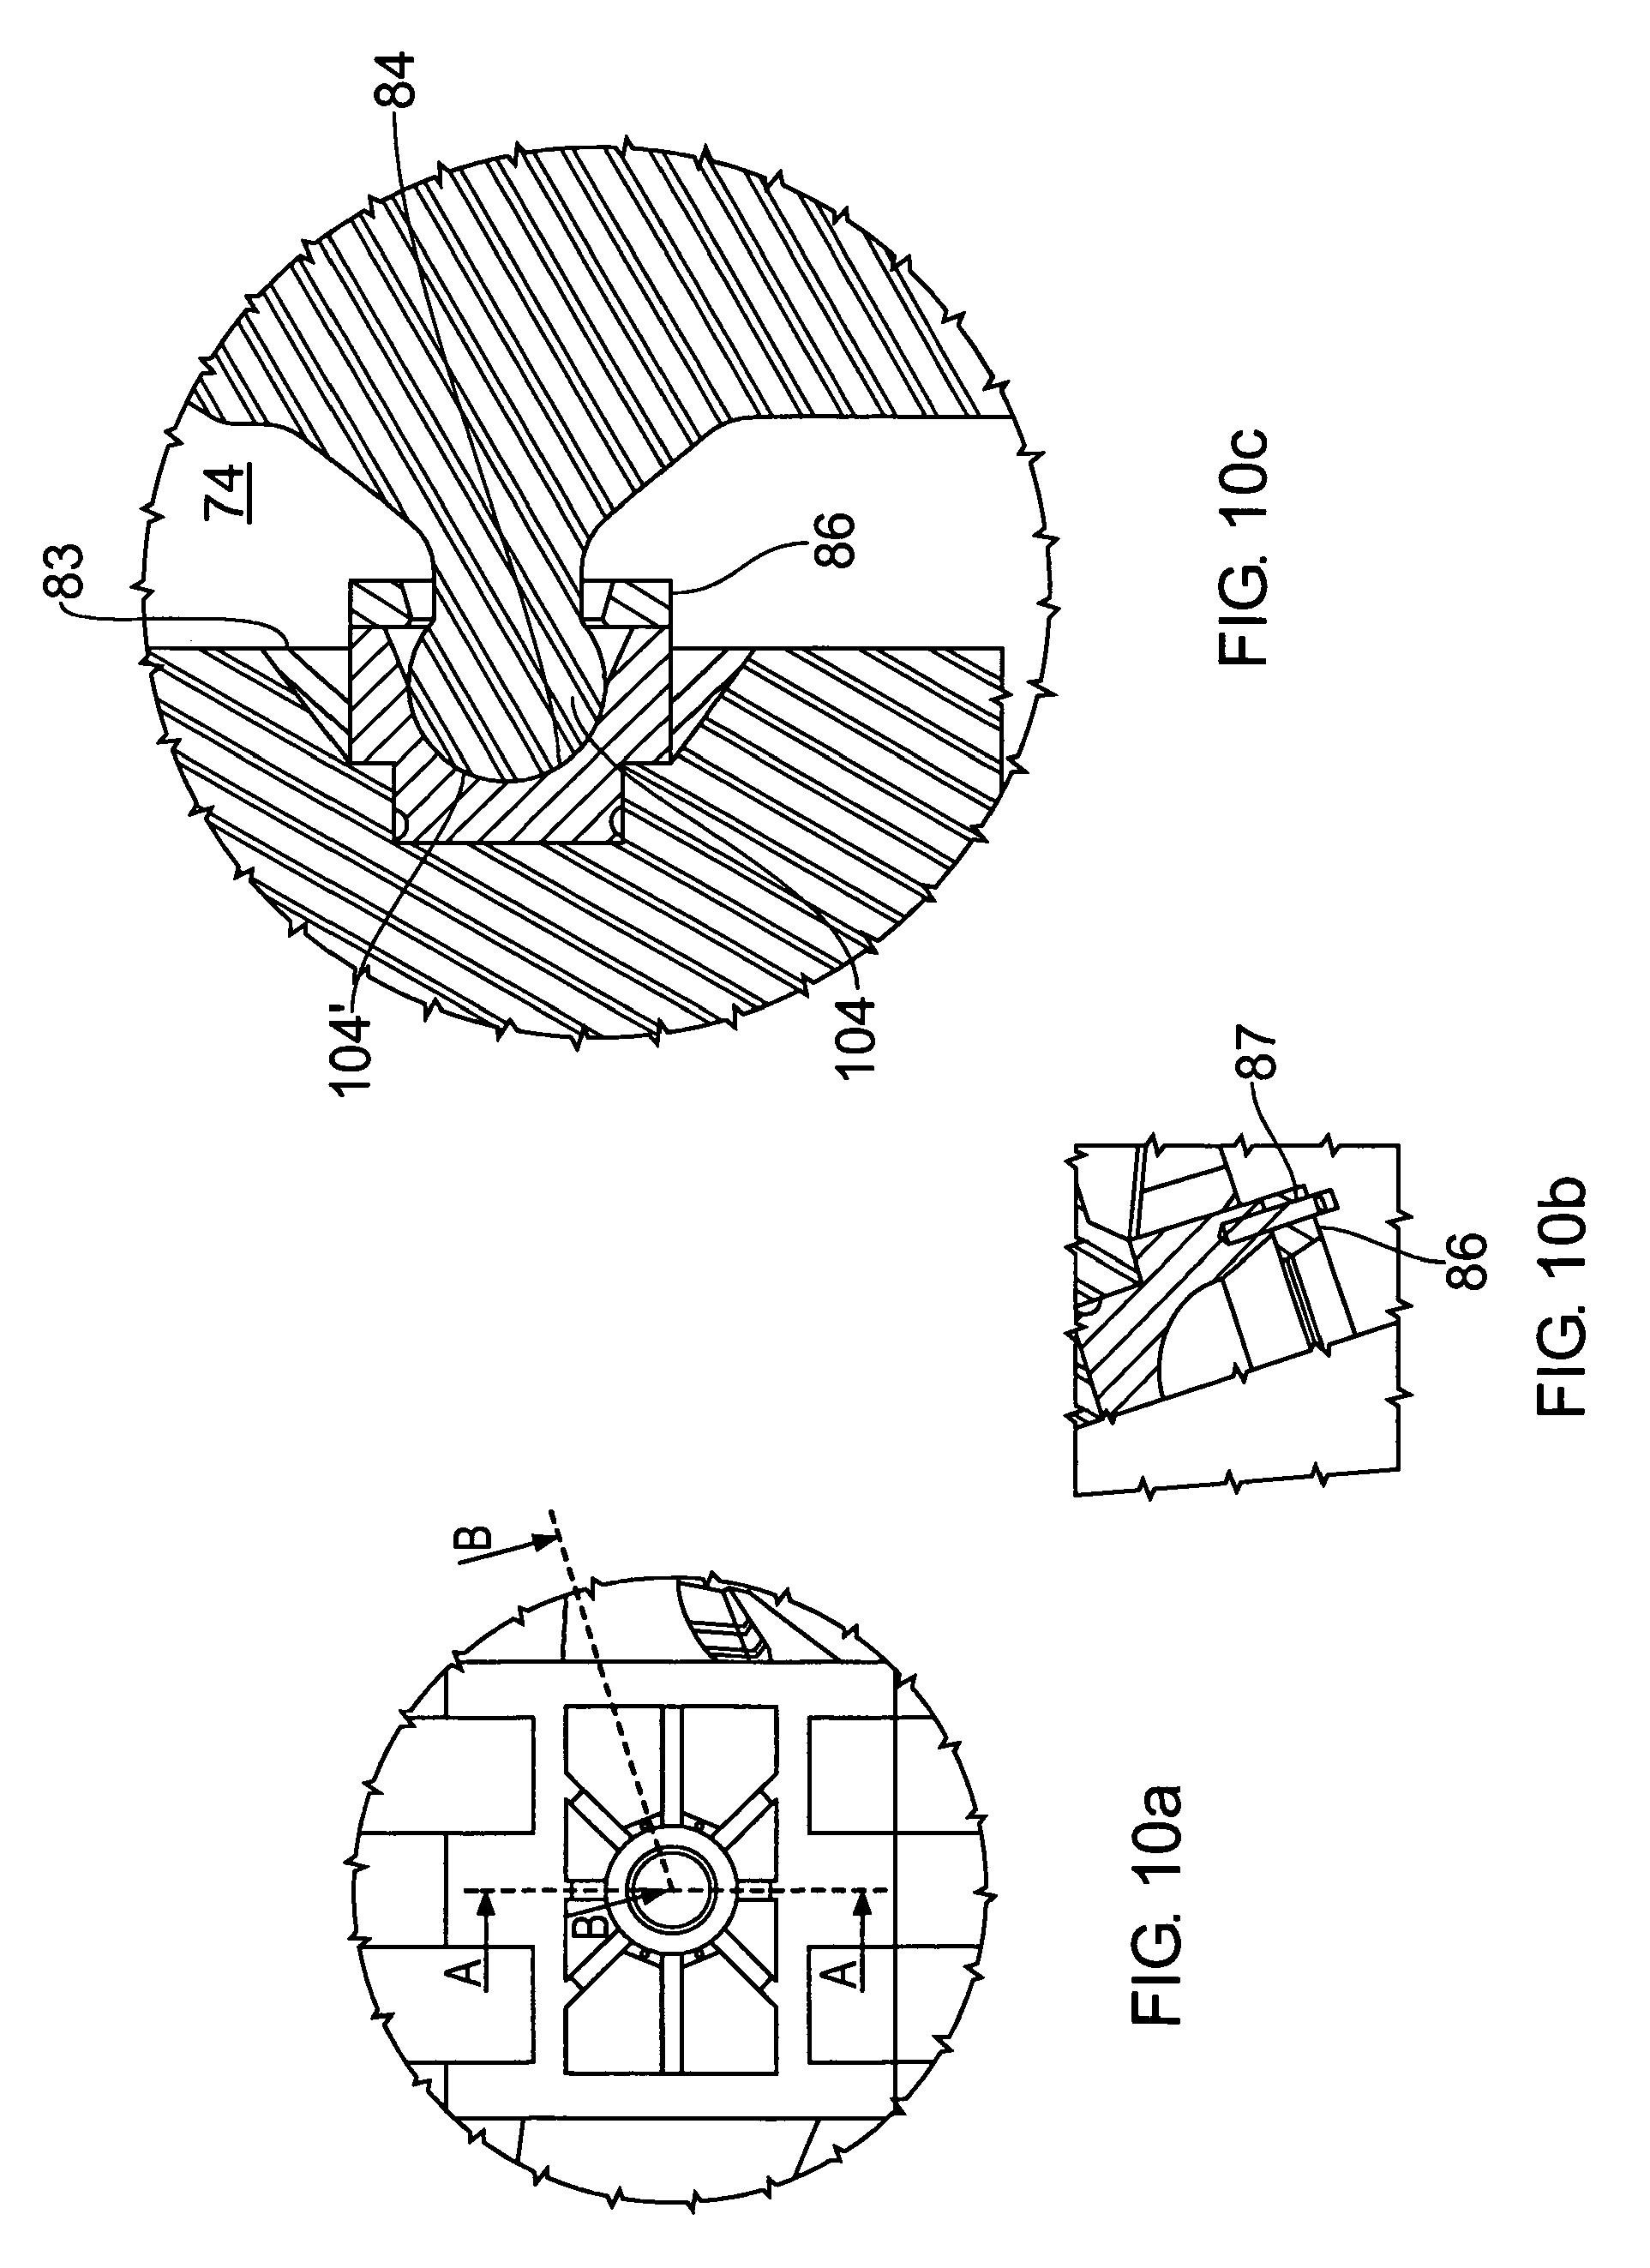 crane hook assembly drawing pdf